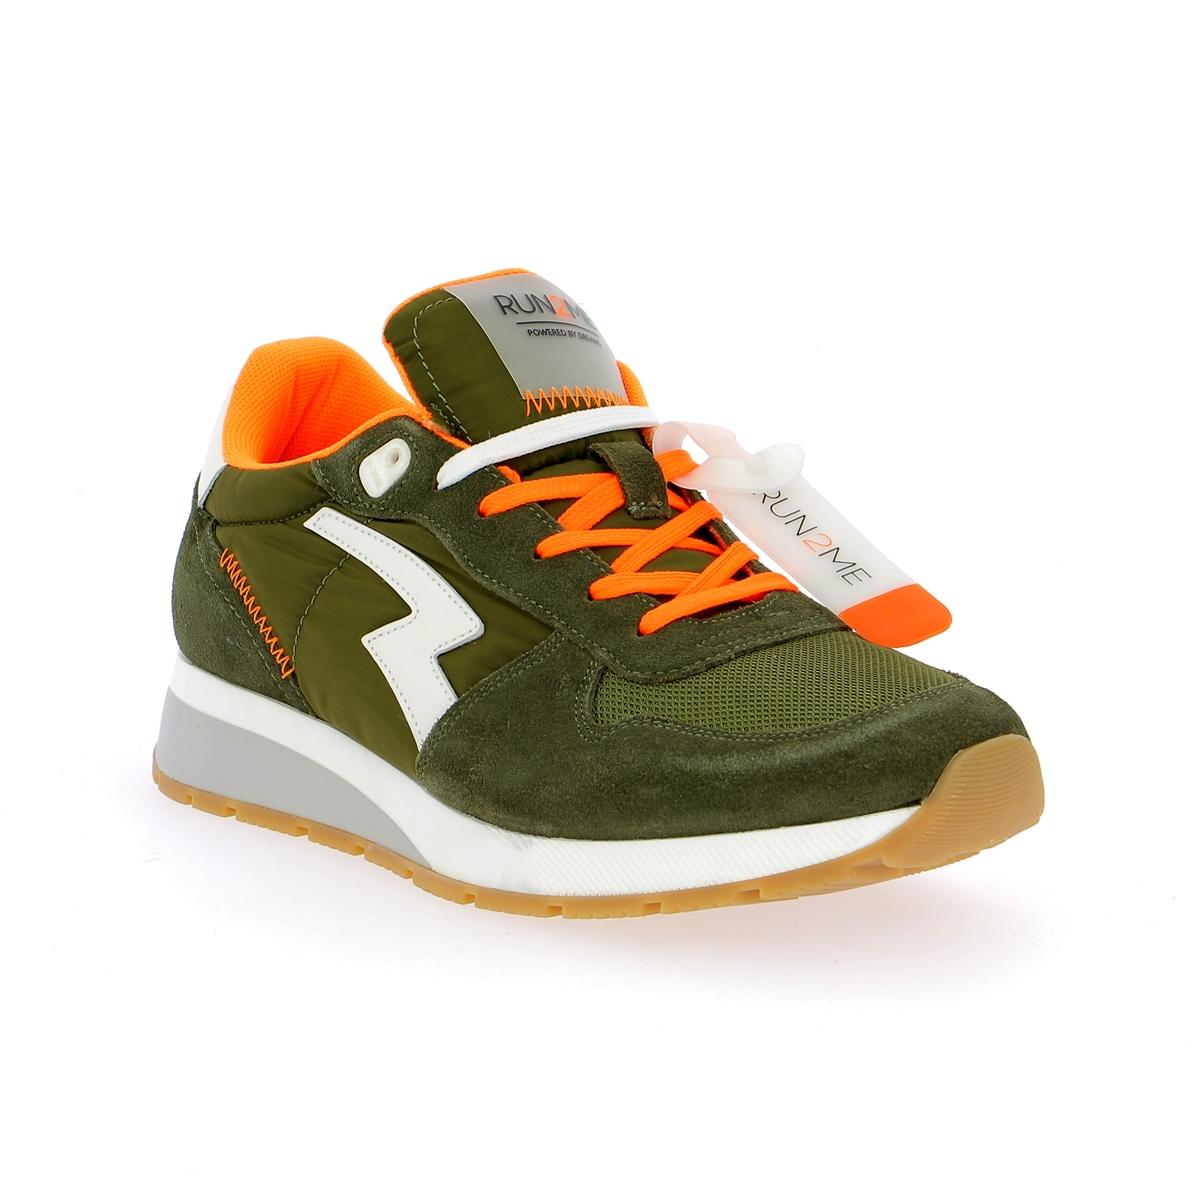 Run2me Sneakers kaki